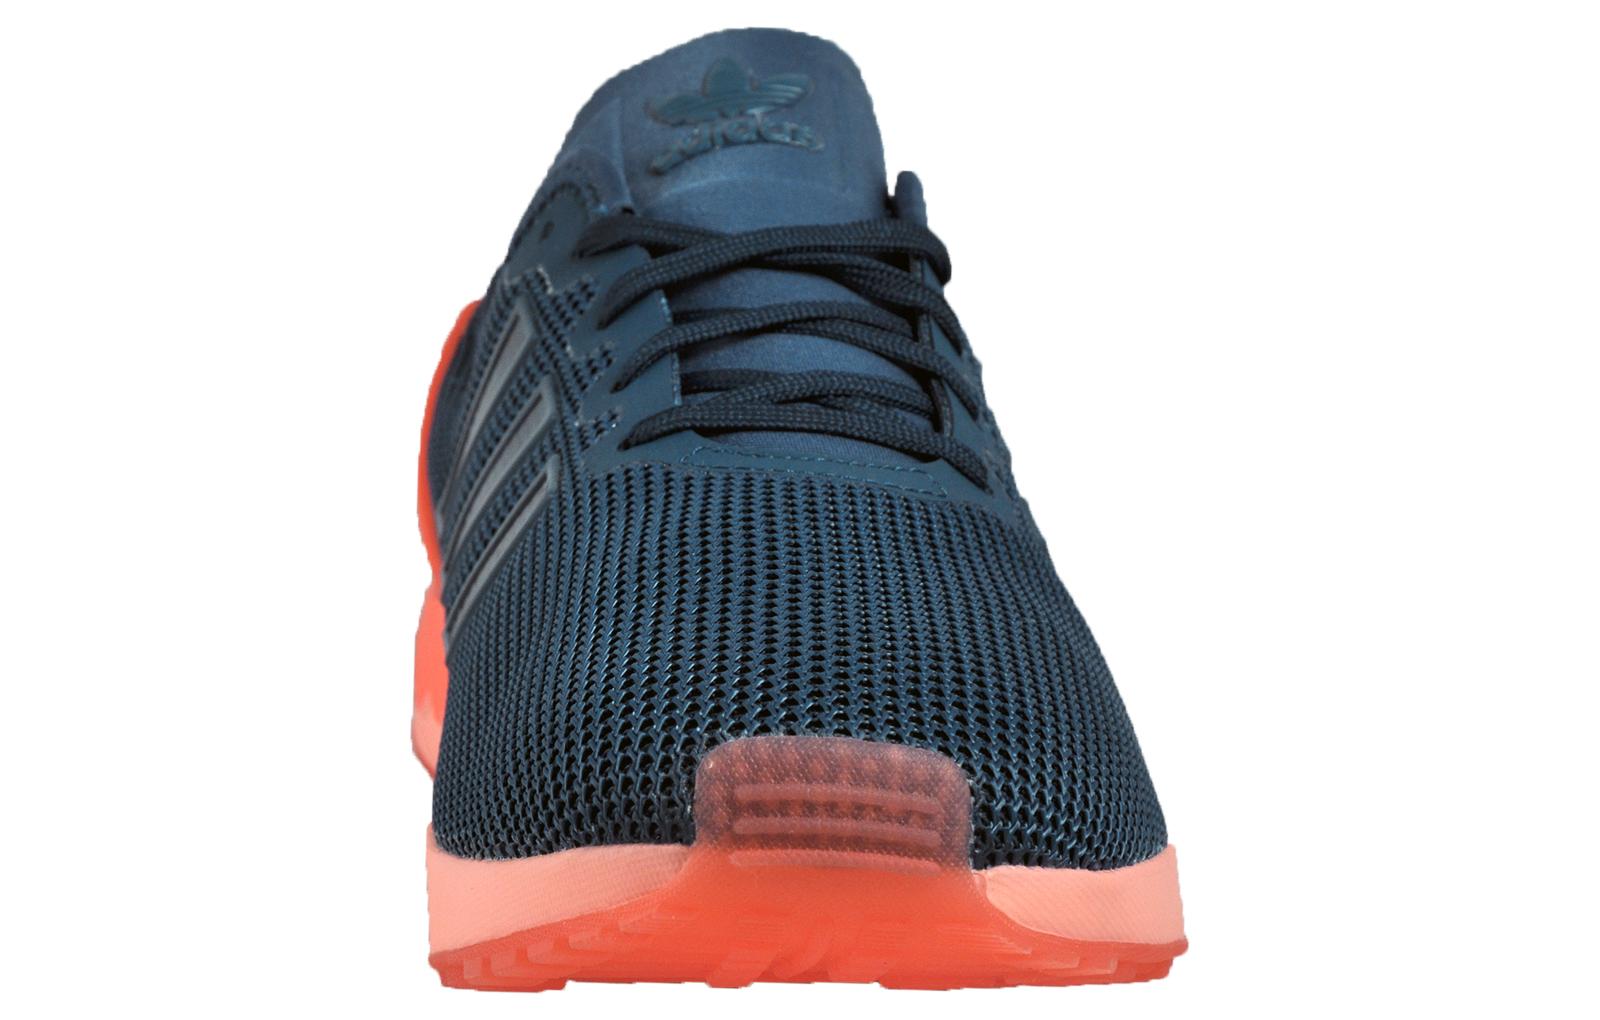 780802fcea1c1 Adidas Originals ZX Flux ADV Mens Classic Casual Running Gym ...